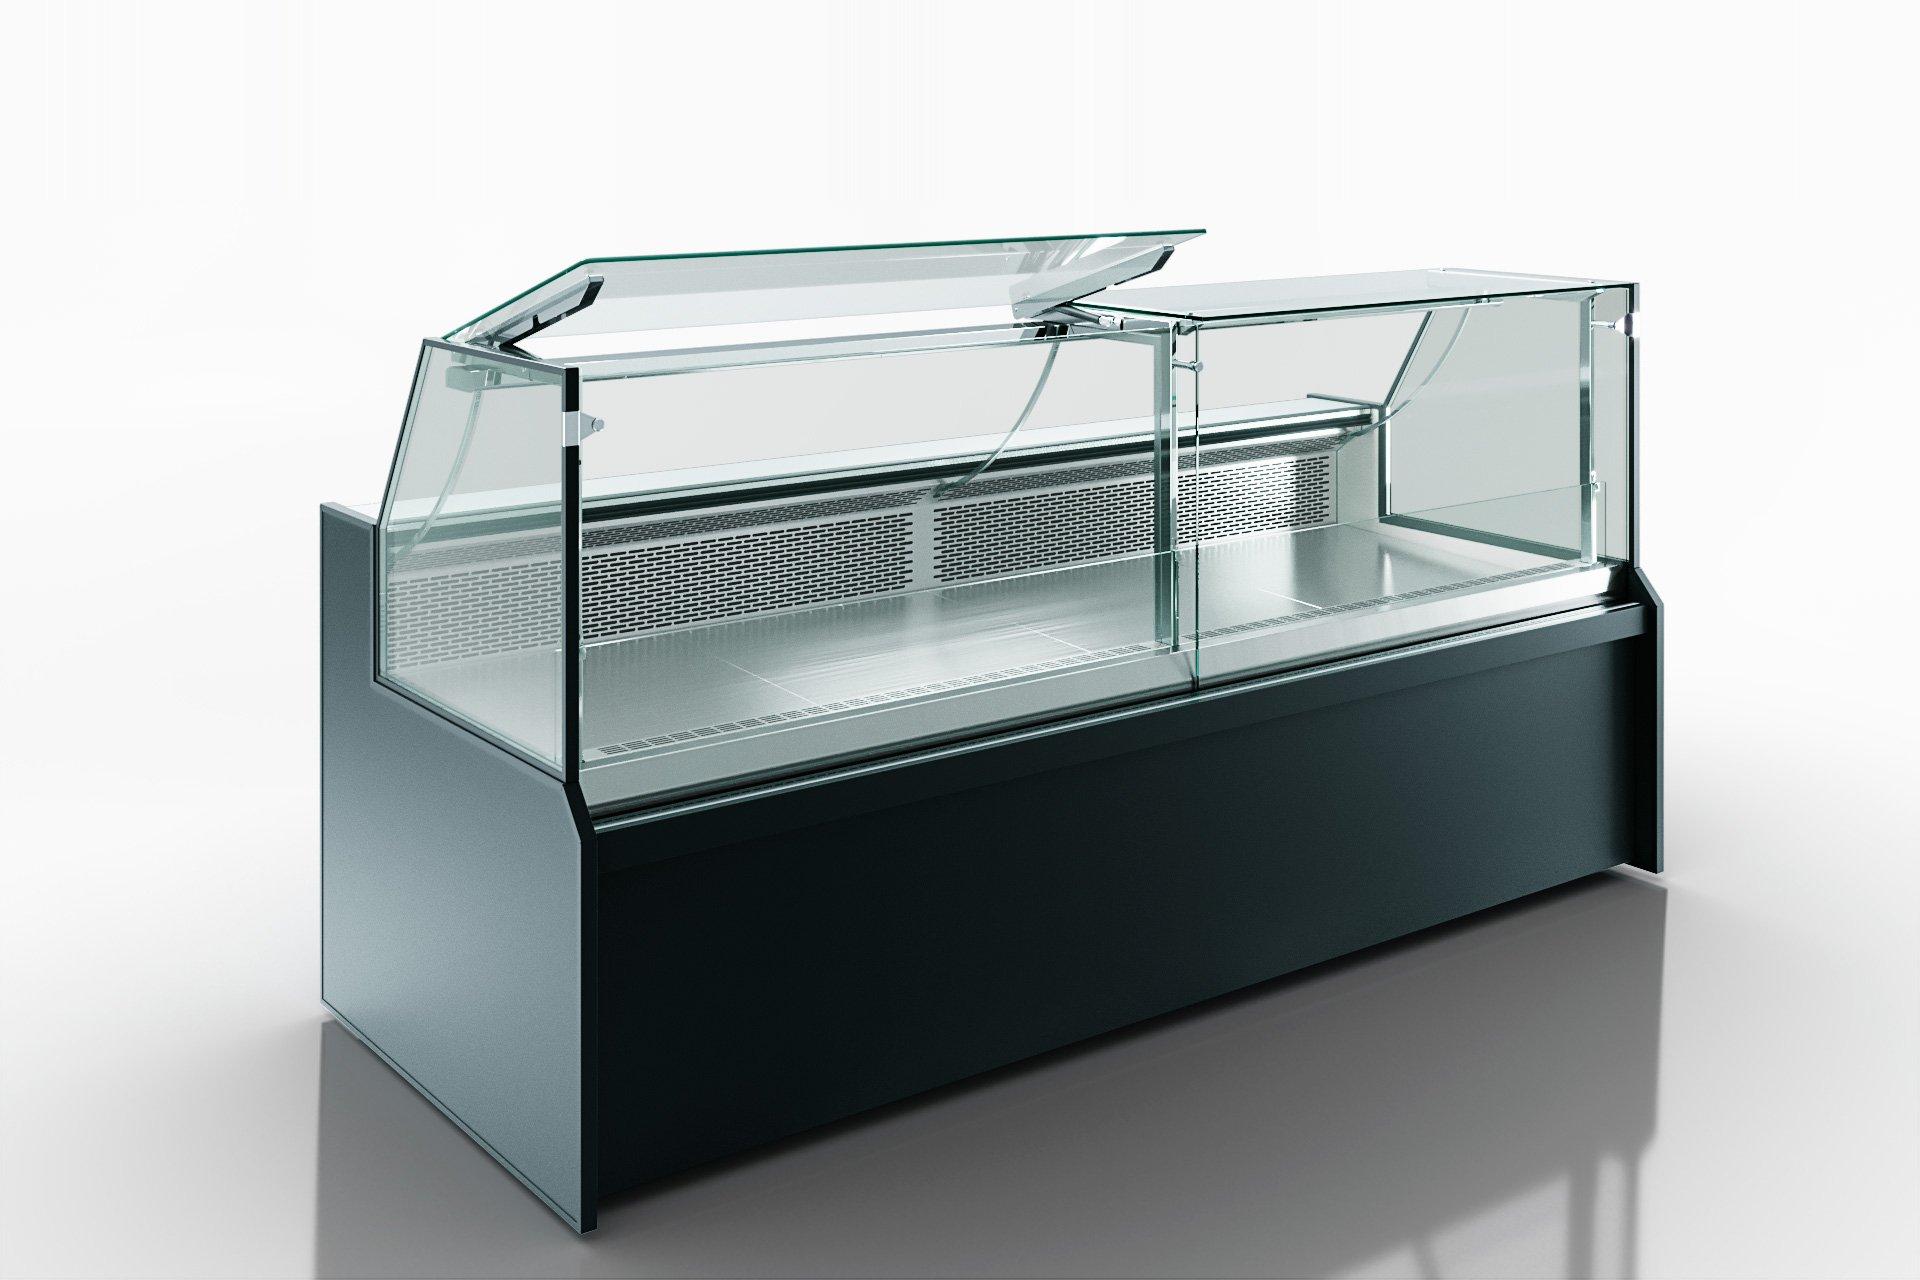 Refrigeration сounters Missouri MC 100 deli PP 130-DBM/DBA